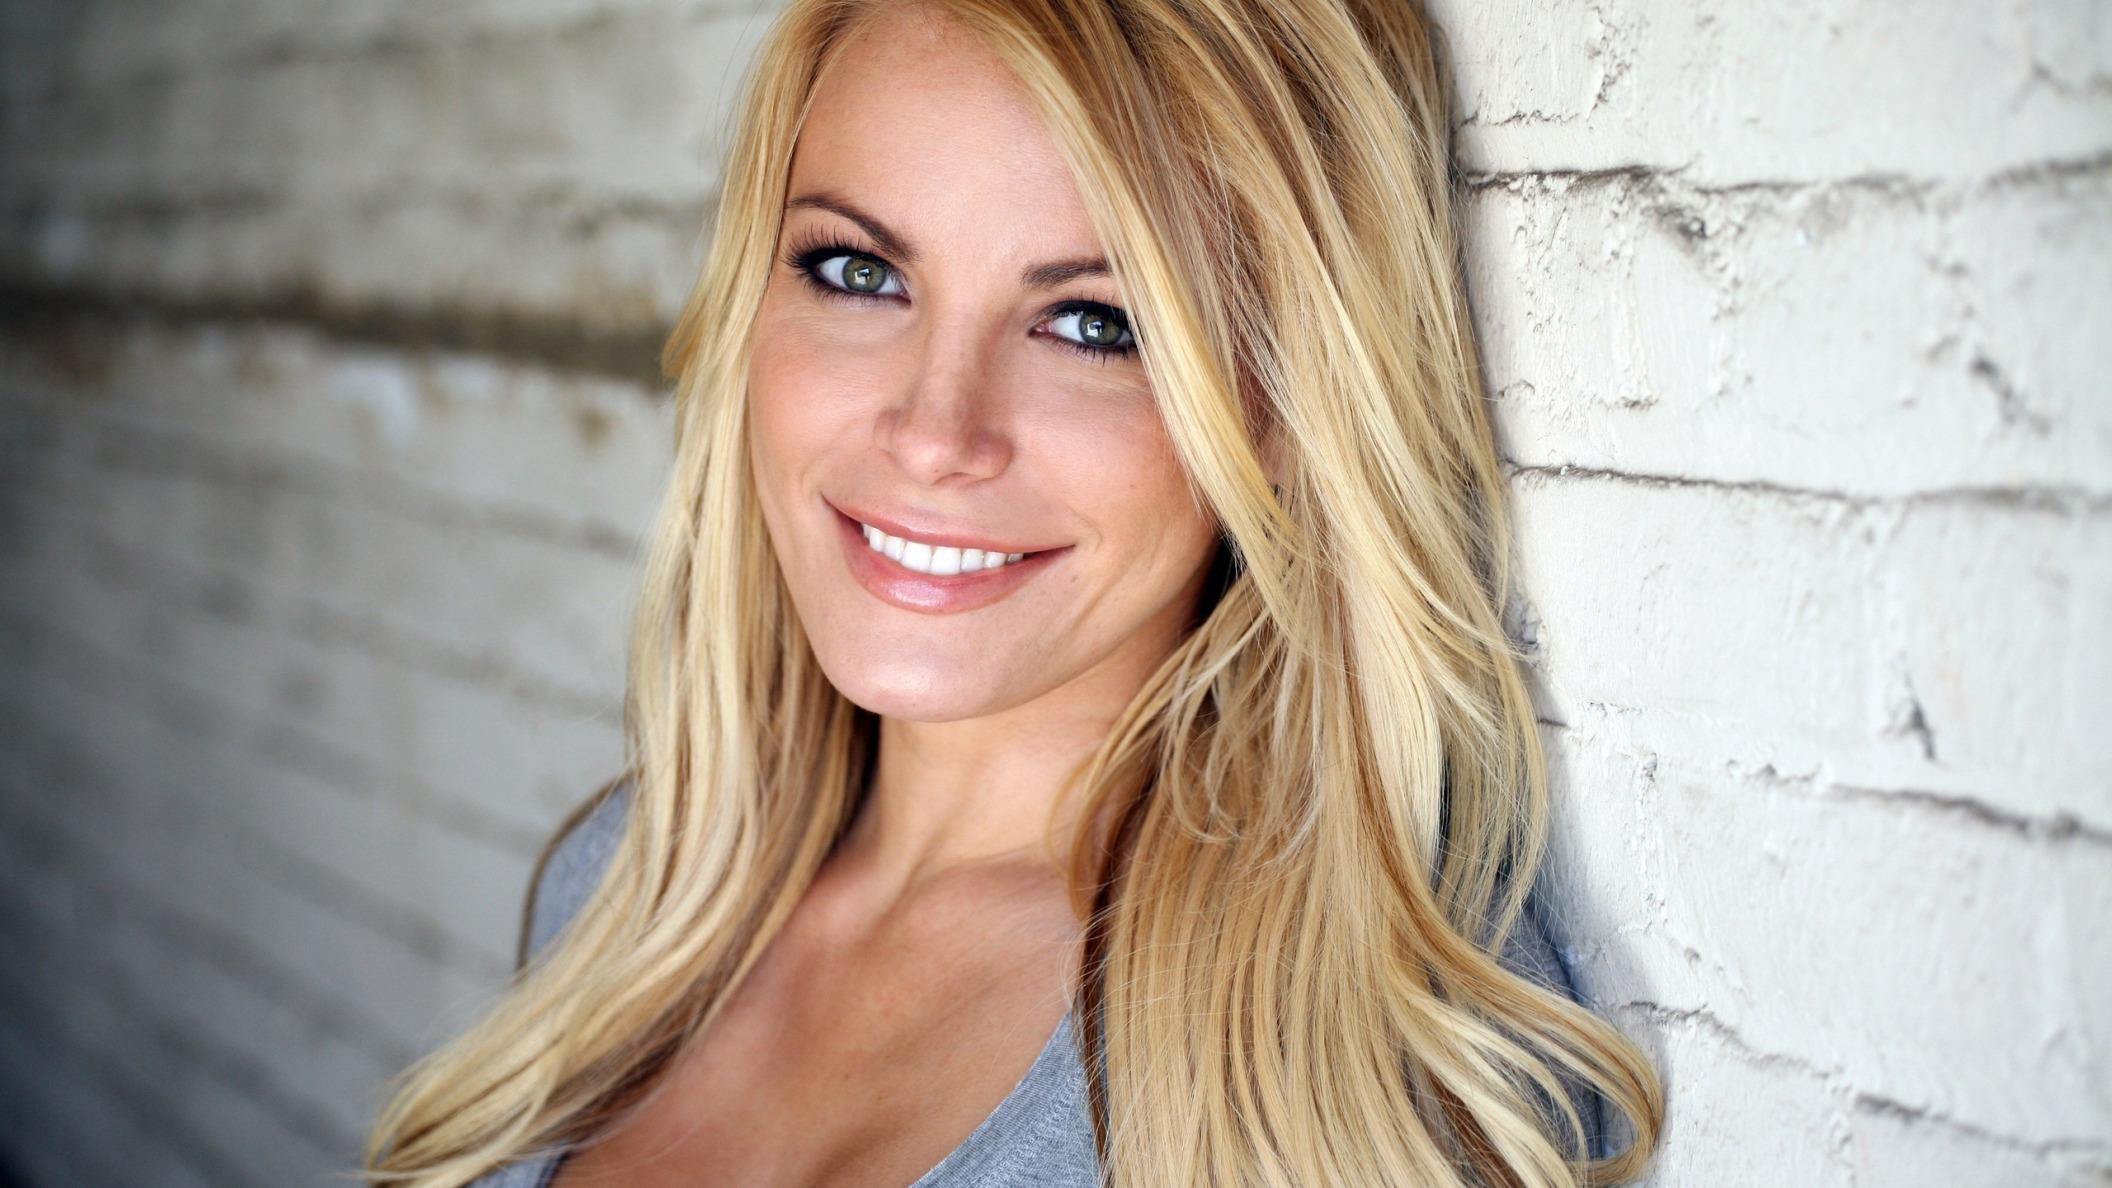 foto-omskih-blondinok-porno-bet-po-klitoru